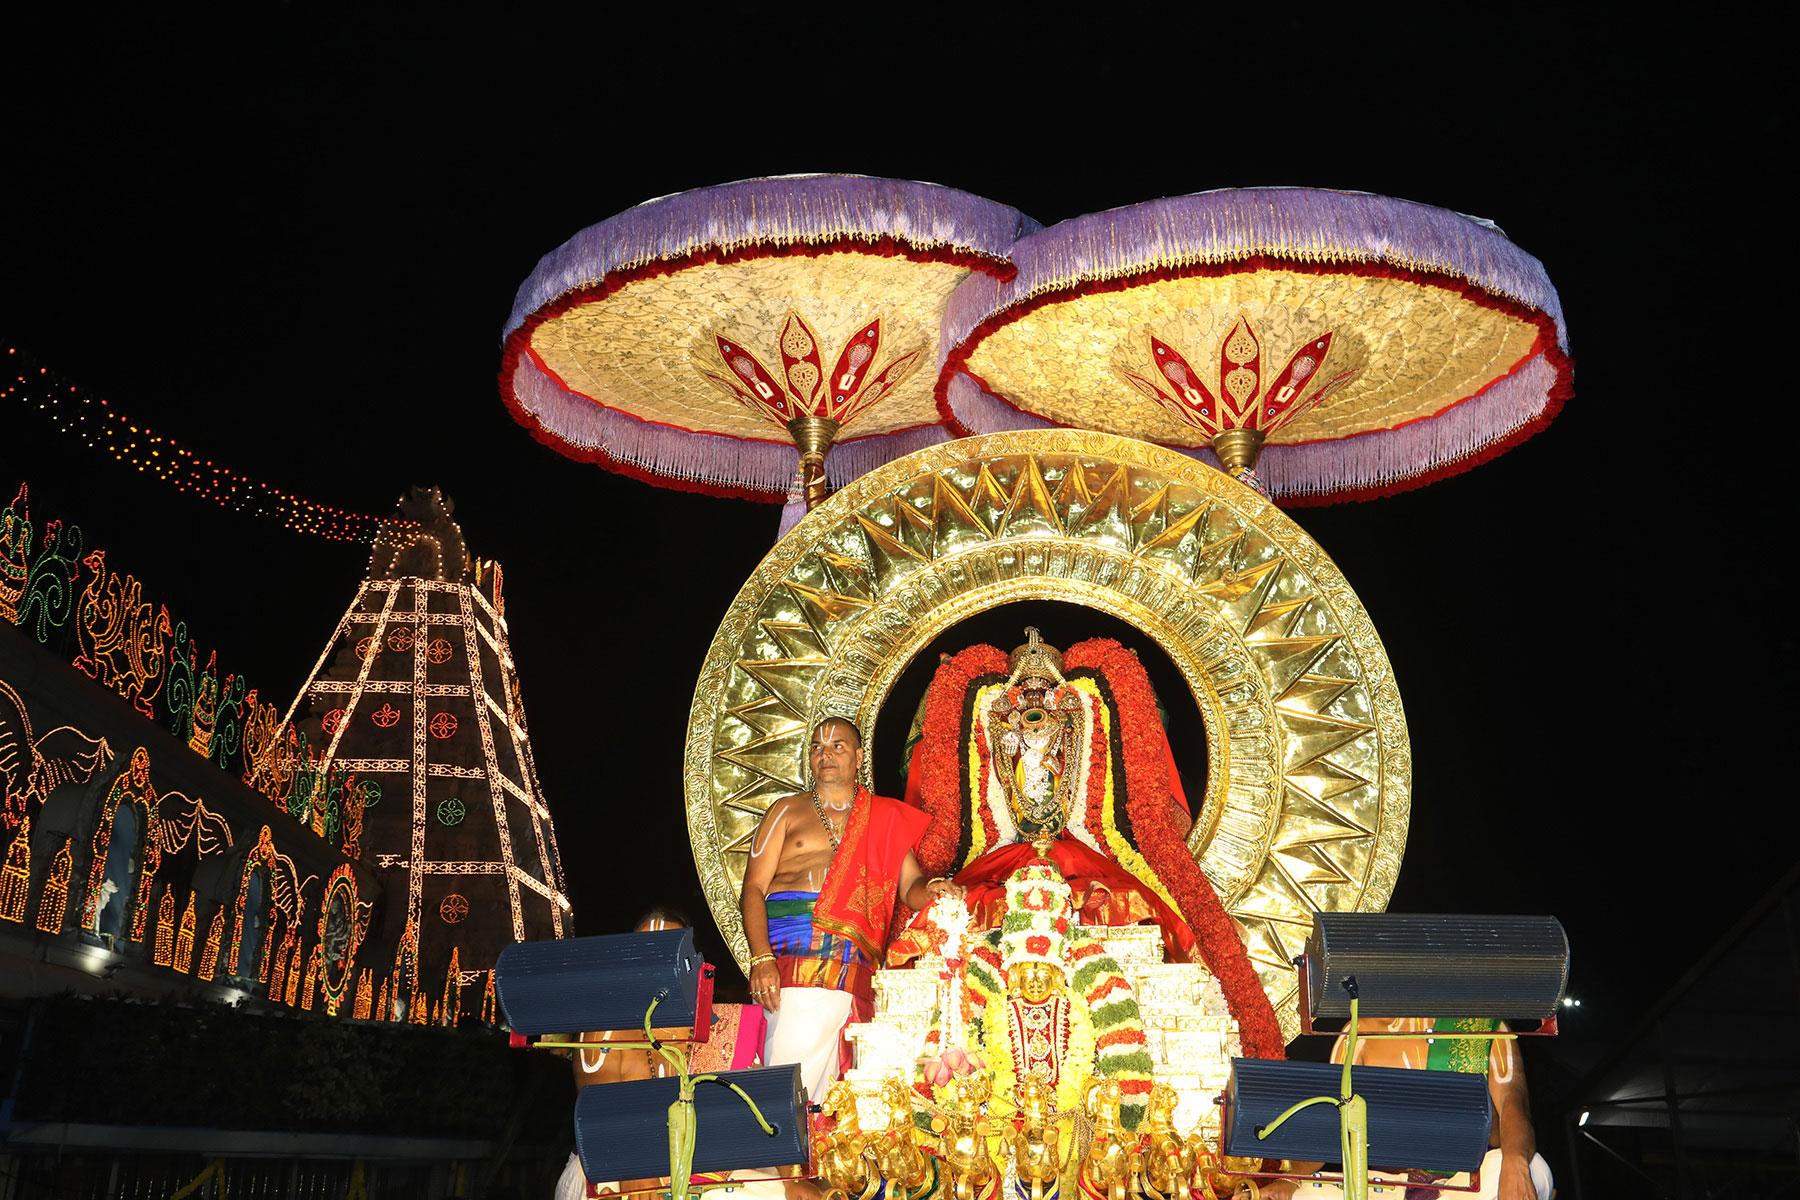 Surya prabha vahanam as a part of Radhasapthami in Tirumala on Tuesday